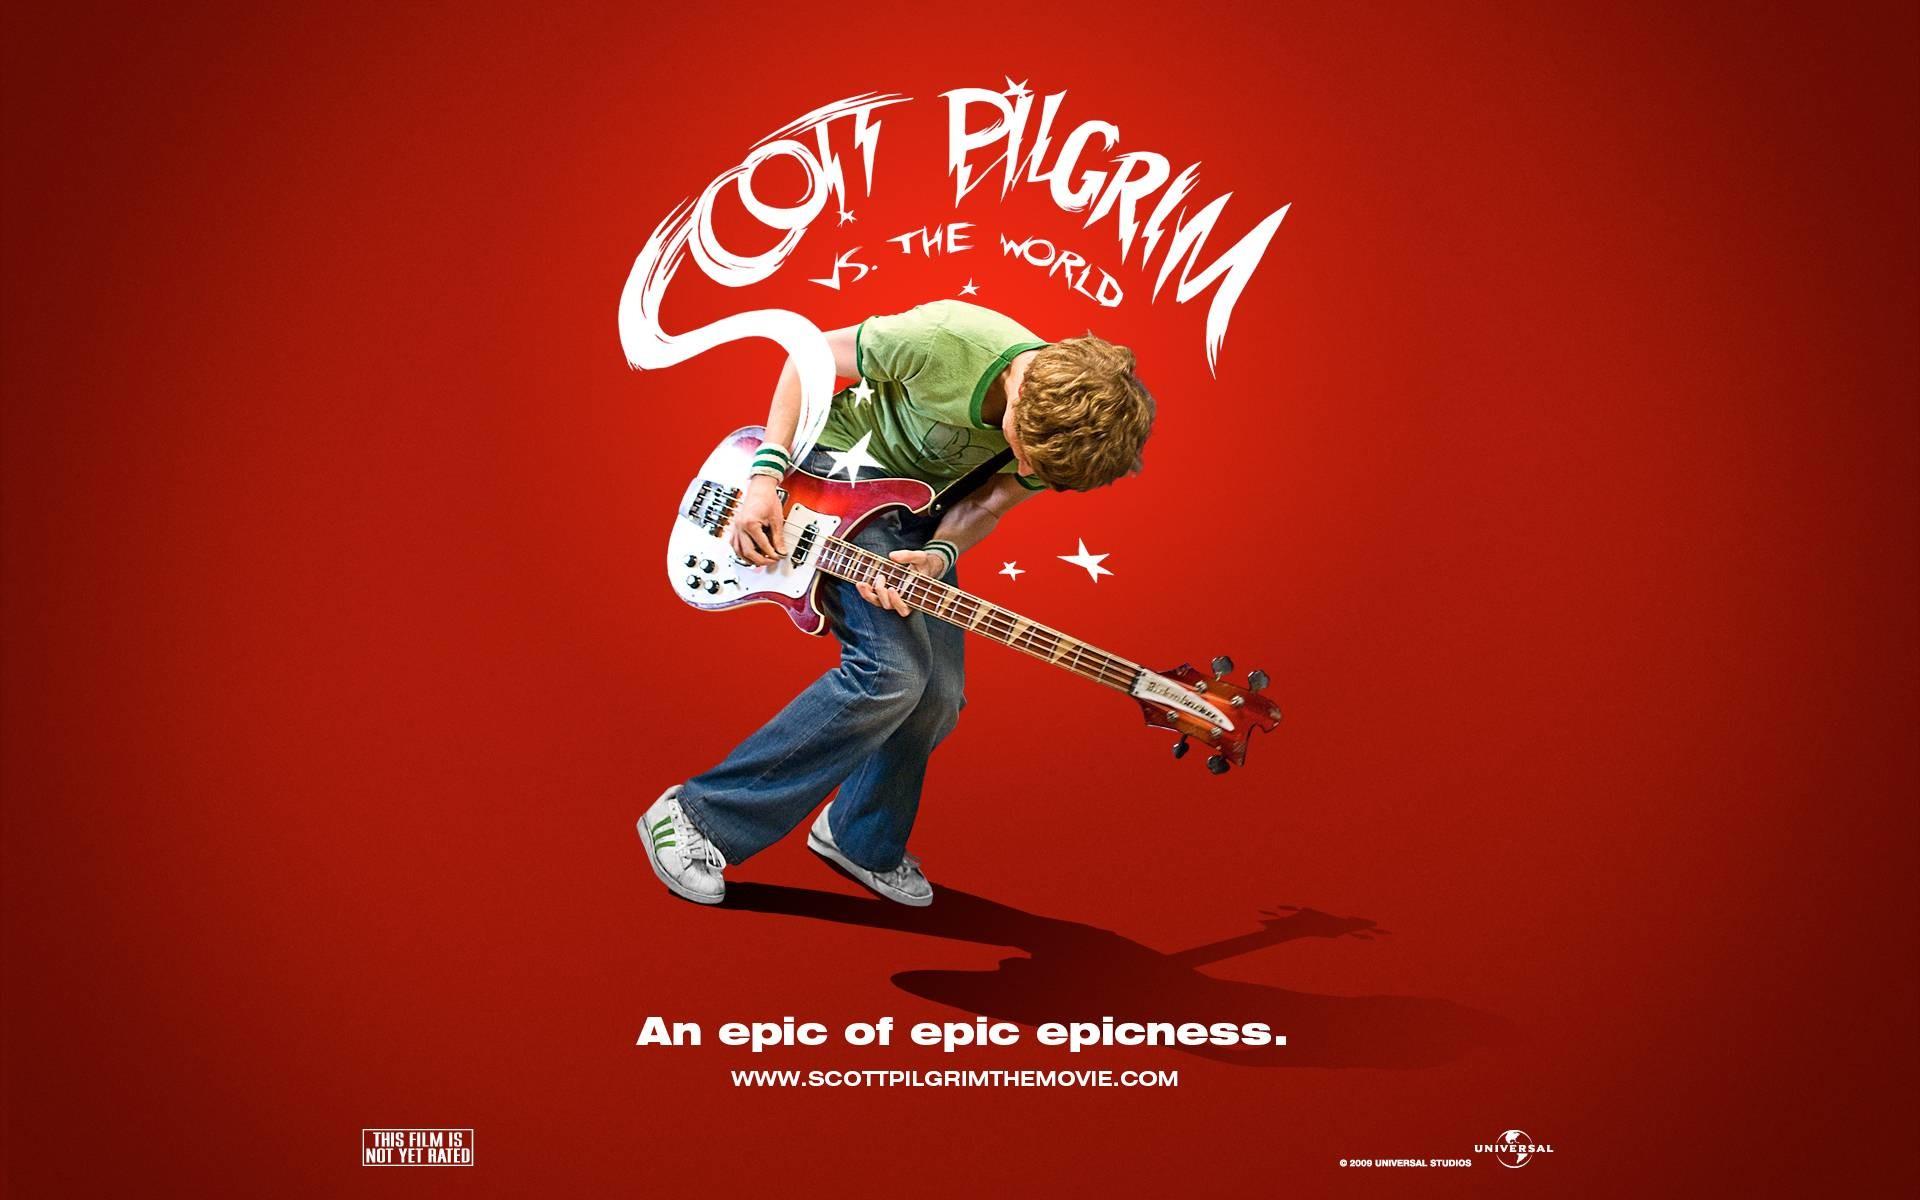 Scott Pilgrim Vs The World wallpaper – 86459